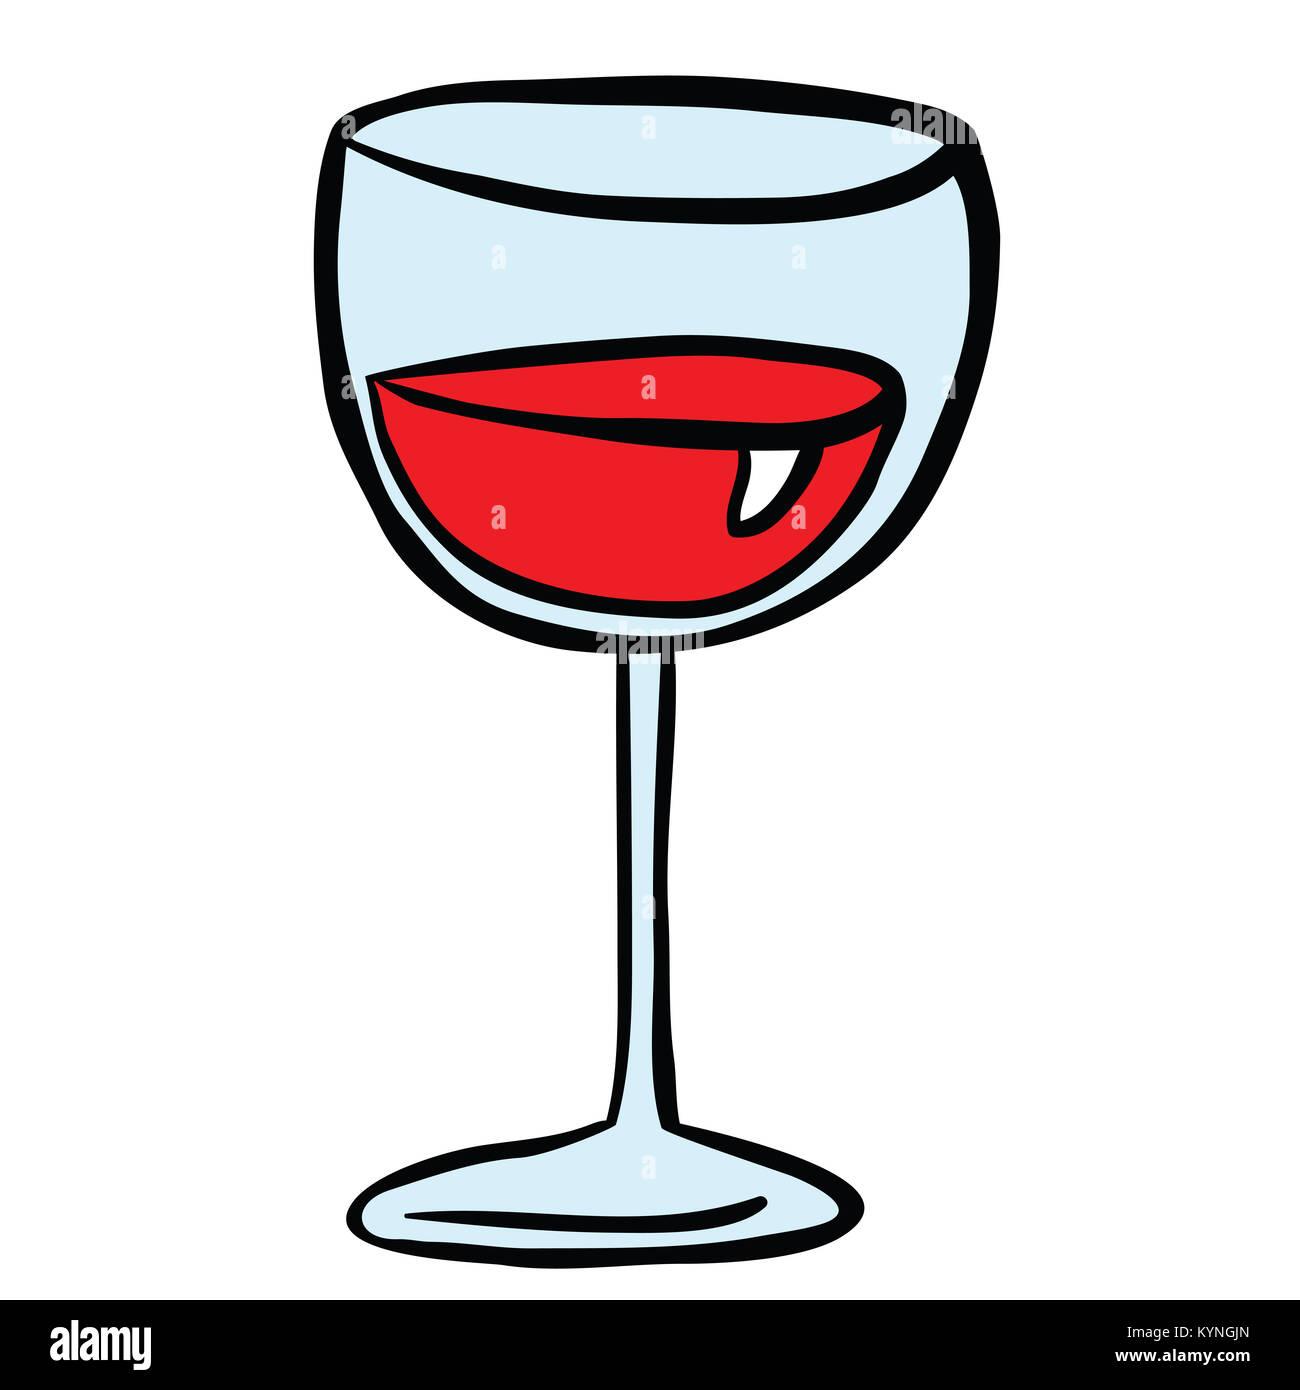 cartoon glass red wine stock photos cartoon glass red wine stock rh alamy com cartoon wine glass images cartoon wine glass clip art